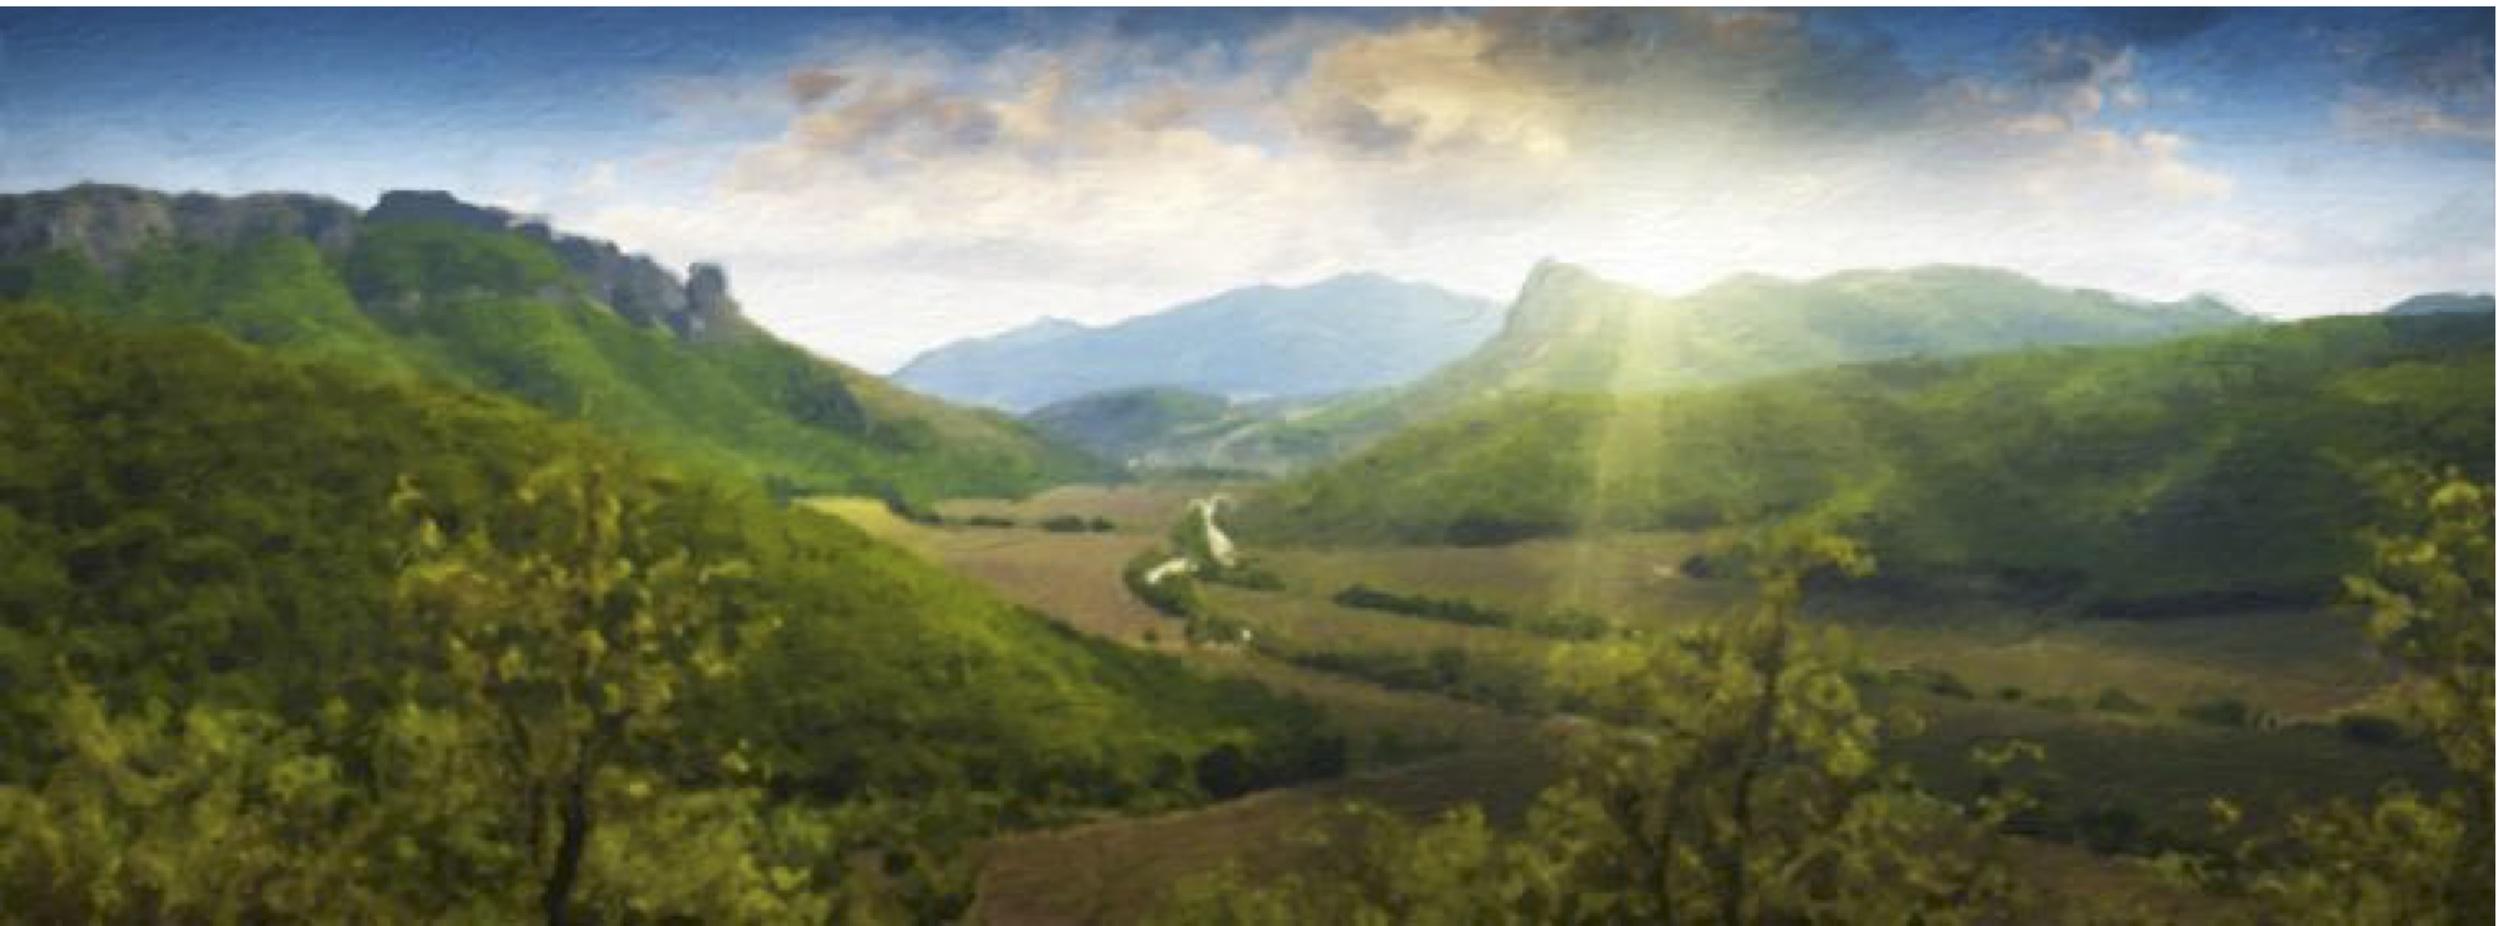 Sunbeam Valley - 38x72 - 4800.jpeg